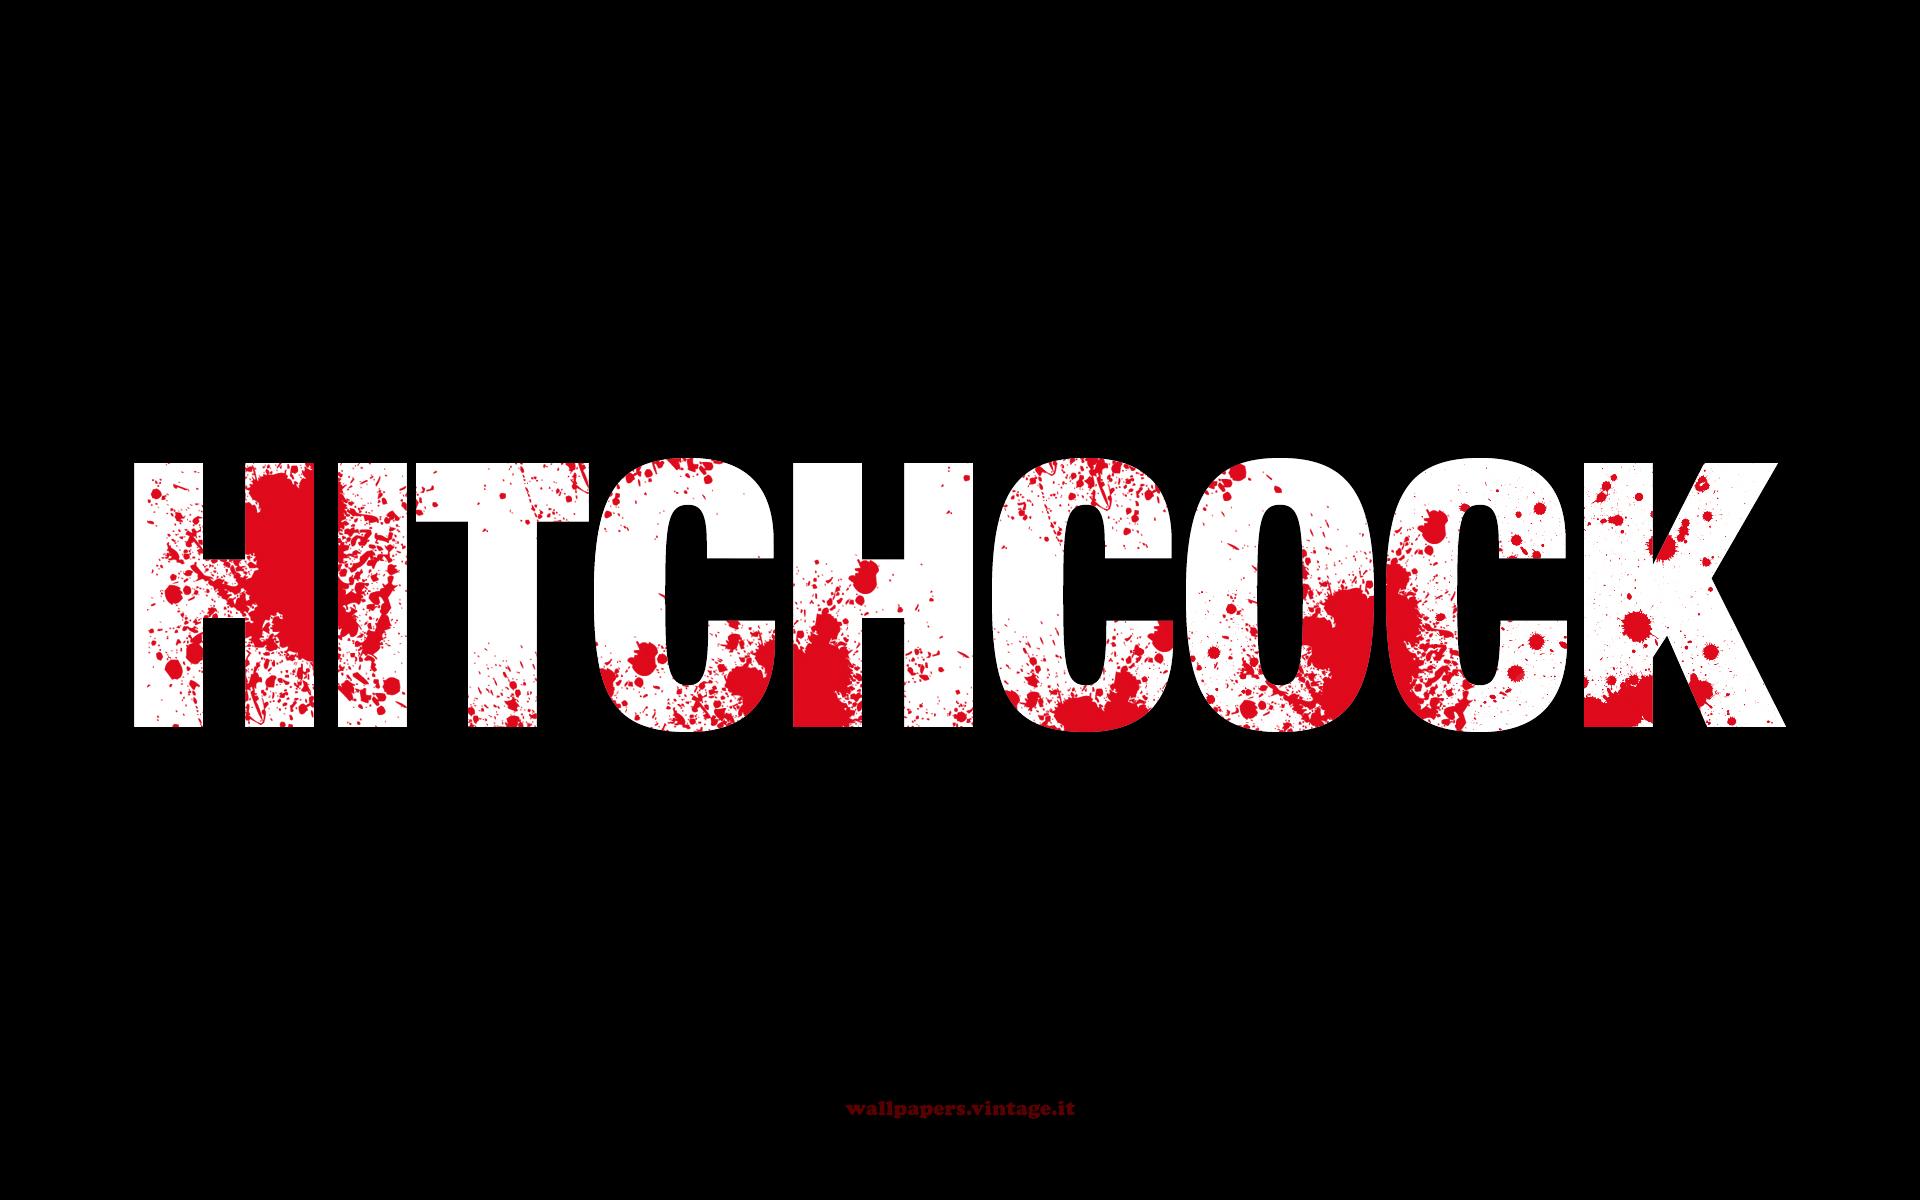 Hitchcock Psycho wallpapers Hitchcock Psycho stock photos 1920x1200